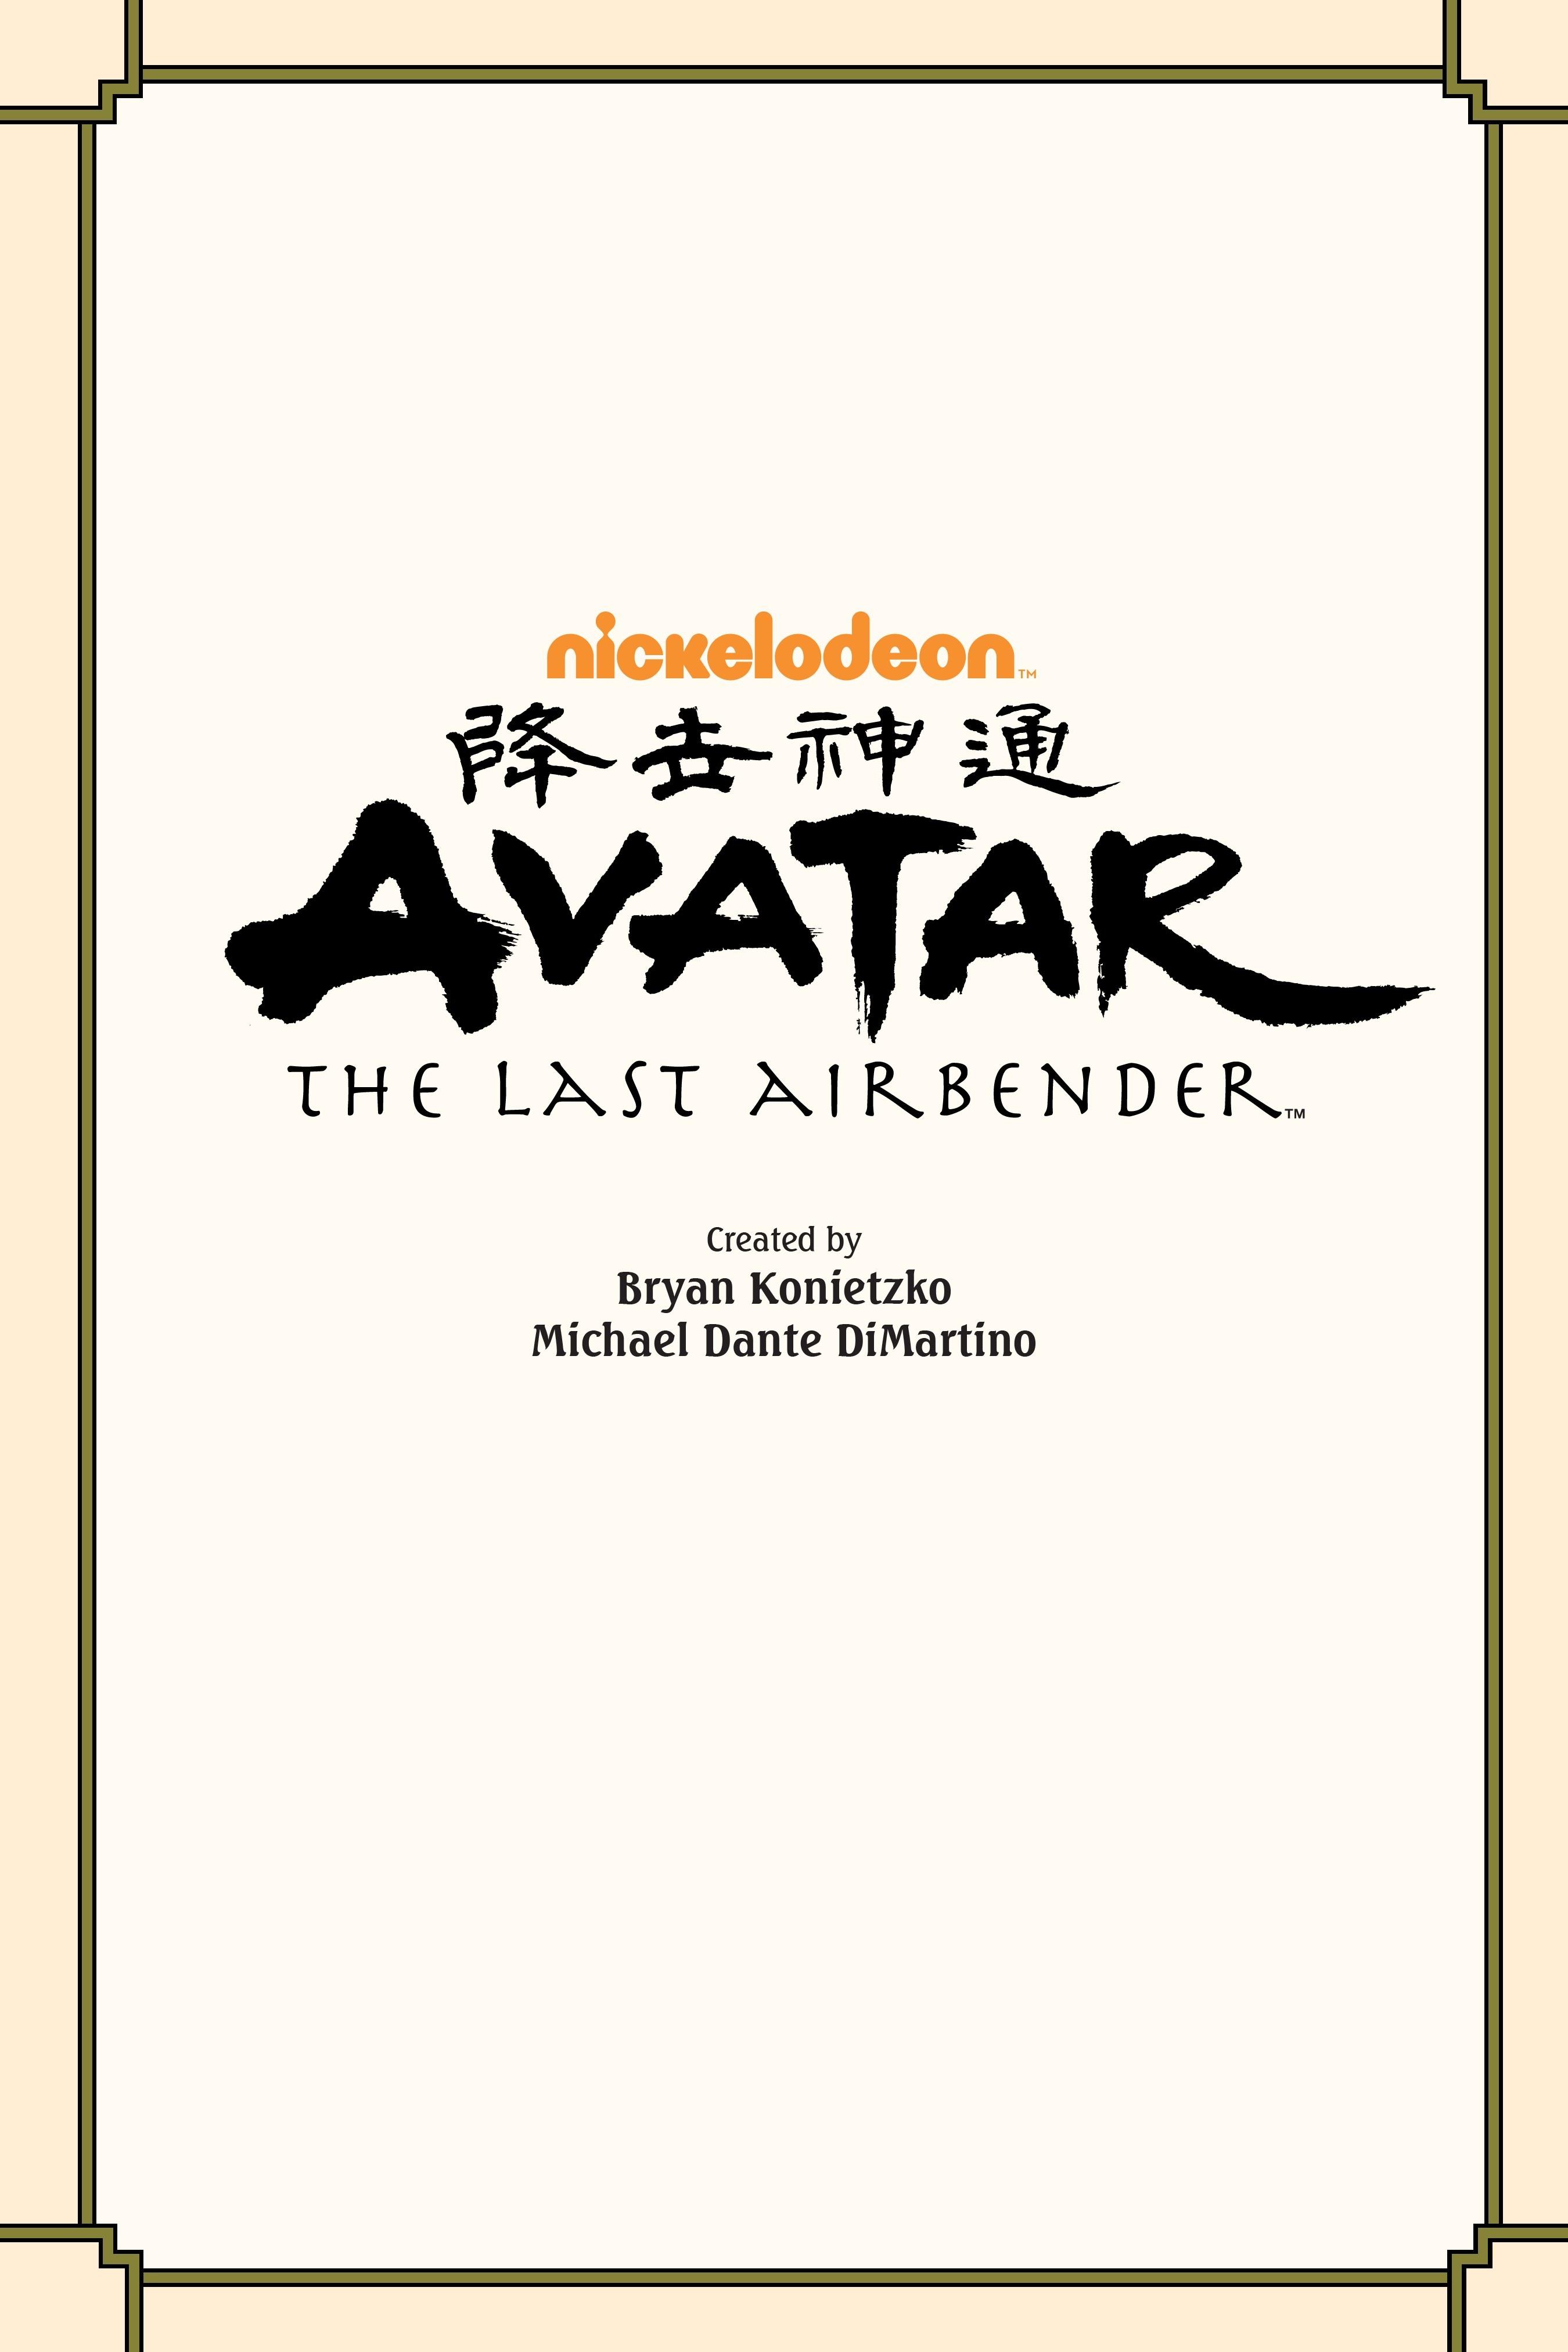 Nickelodeon Avatar: The Last Airbender - Imbalance TPB_2 Page 2